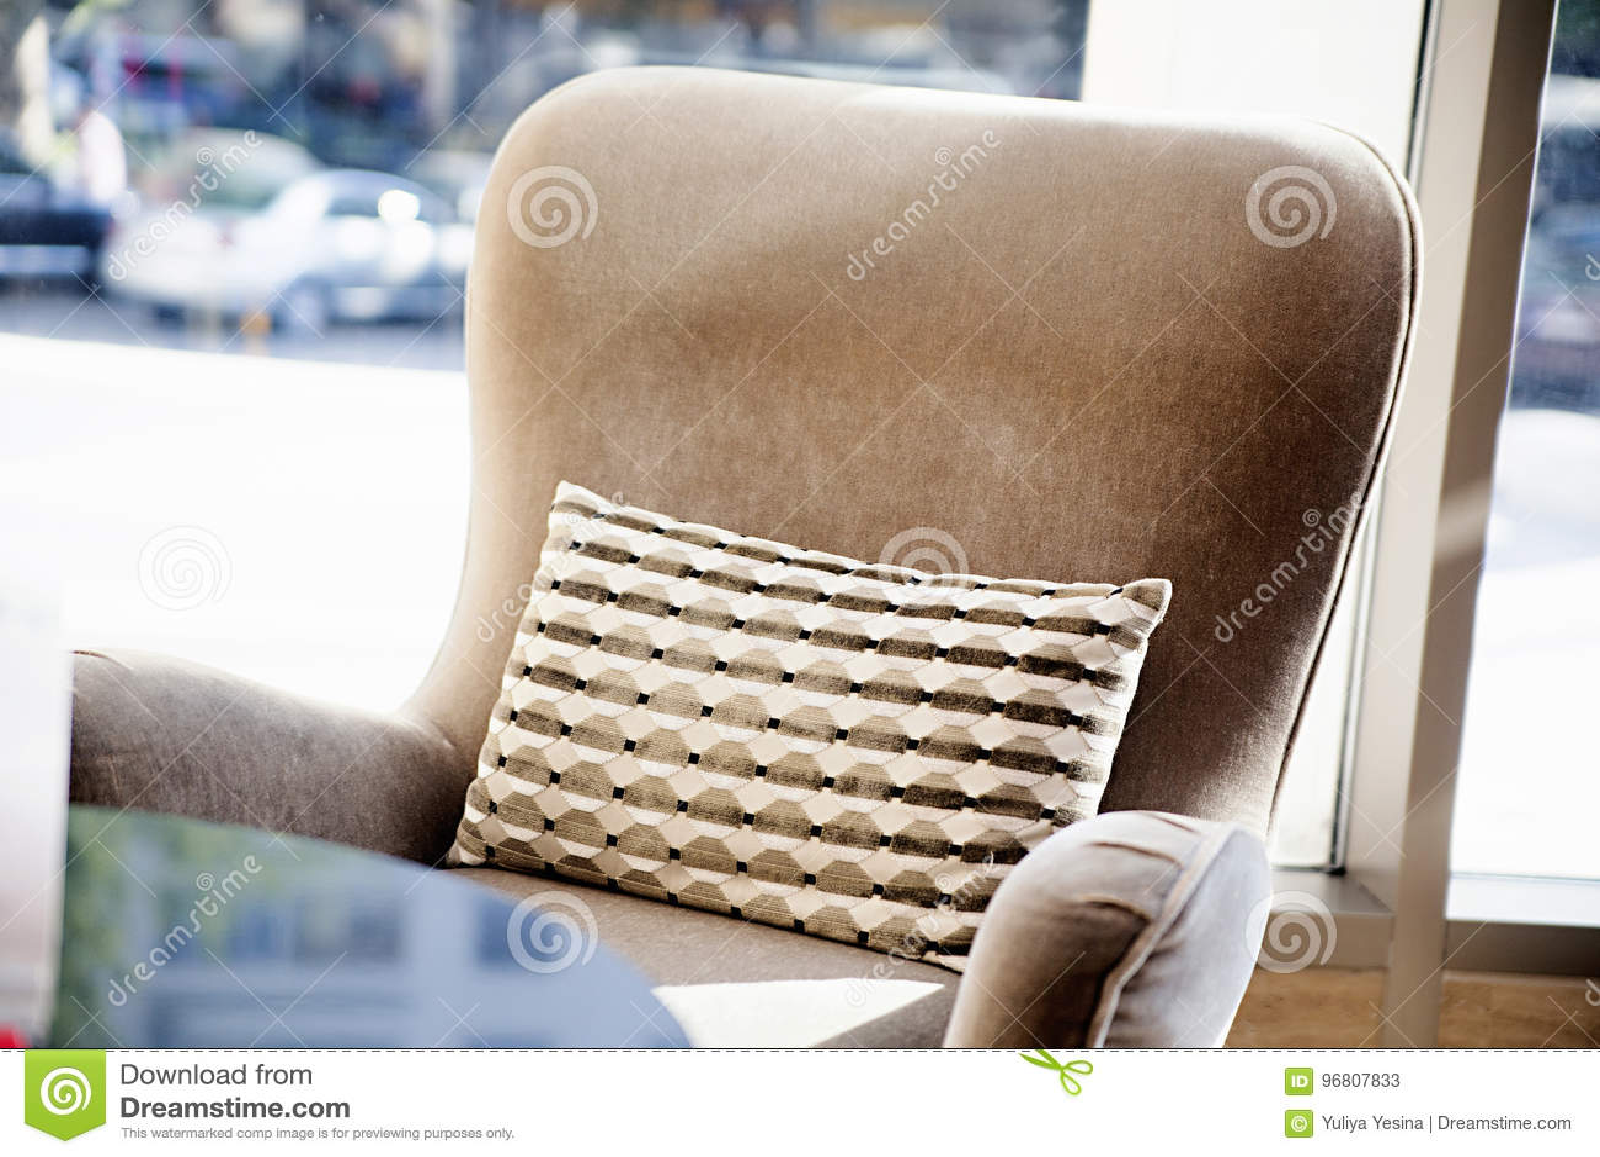 ef057e215130 Μαλακή πολυθρόνα κοντά στον πίνακα Στοκ Εικόνα - εικόνα από ...